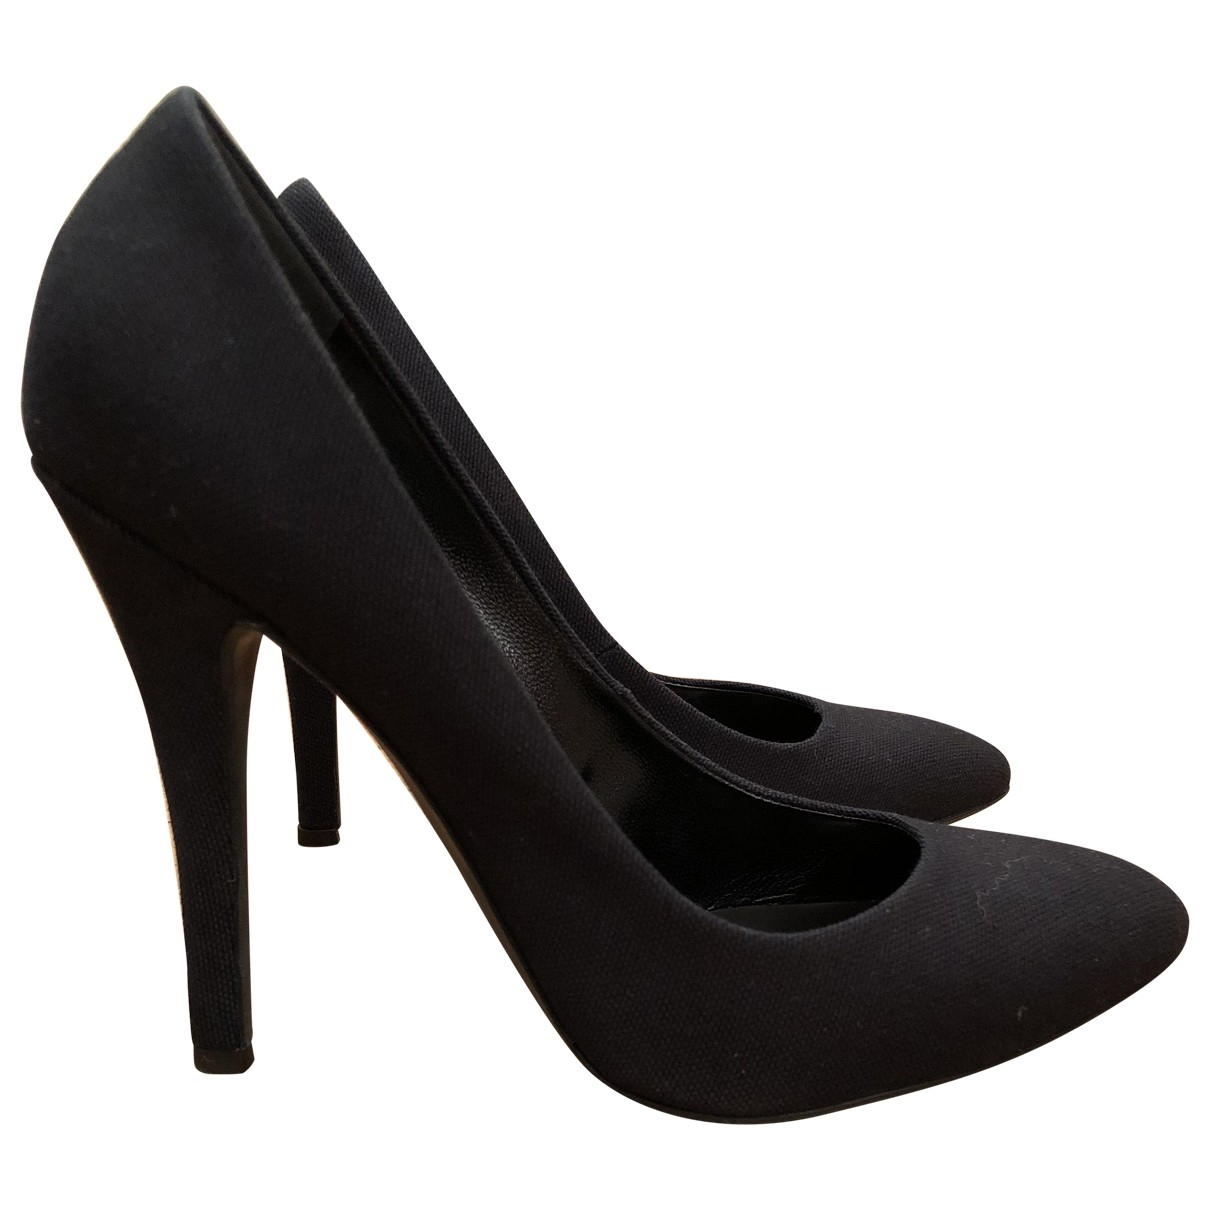 Giuseppe Zanotti X Balmain \N Black Cloth Heels for Women 37.5 EU